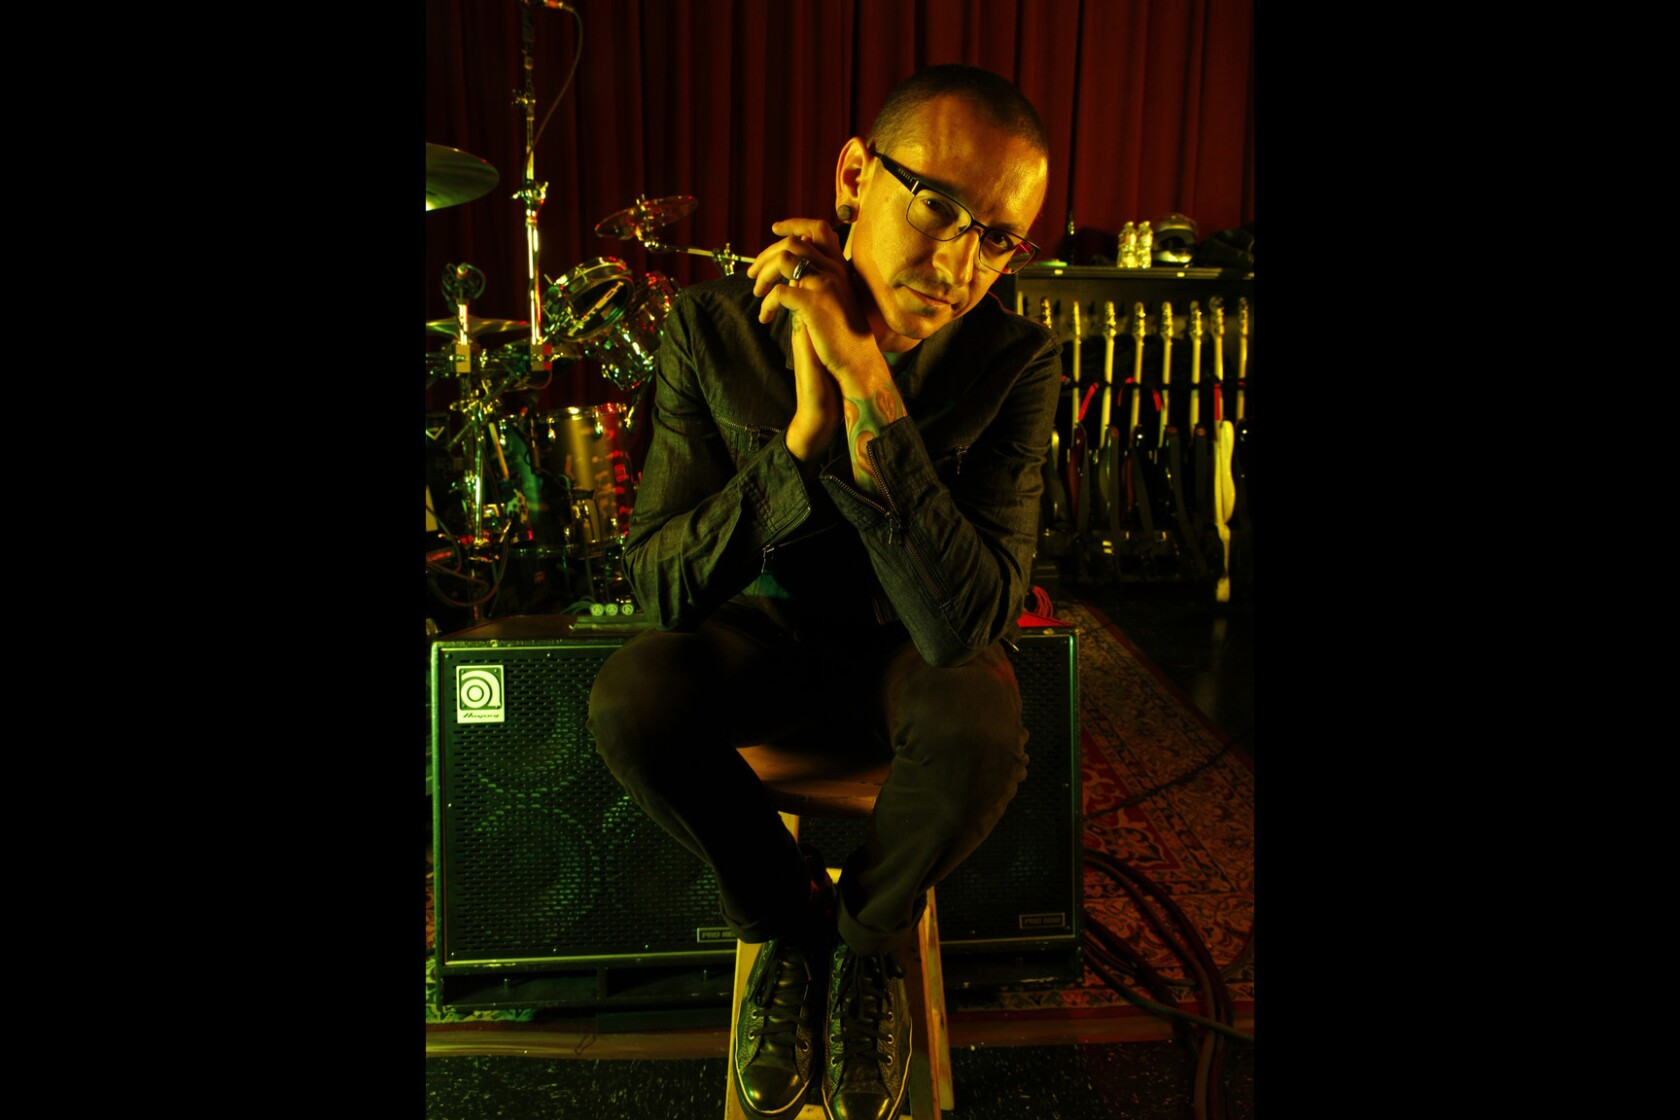 Linkin Park frontman Chester Bennington dies at 41 - Los